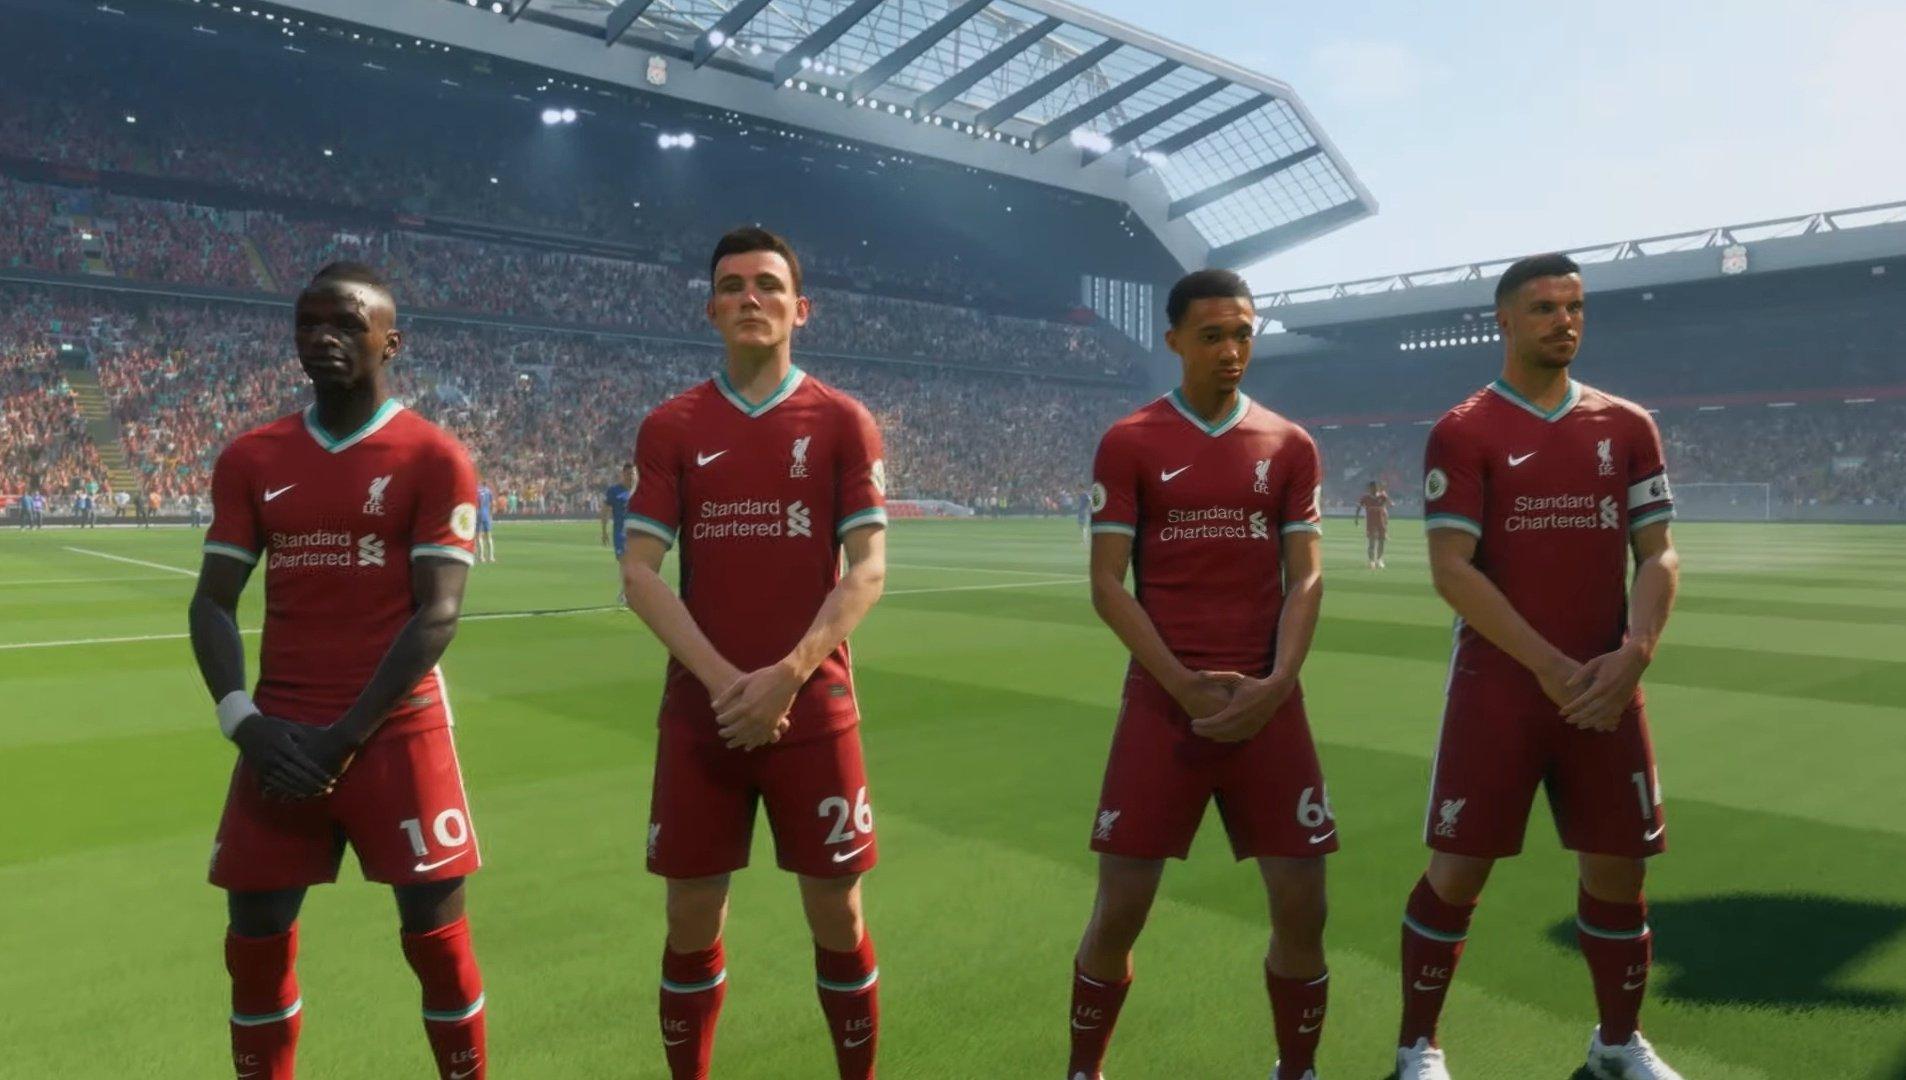 Liverpool players fifa 21 henderson mane trent robertson